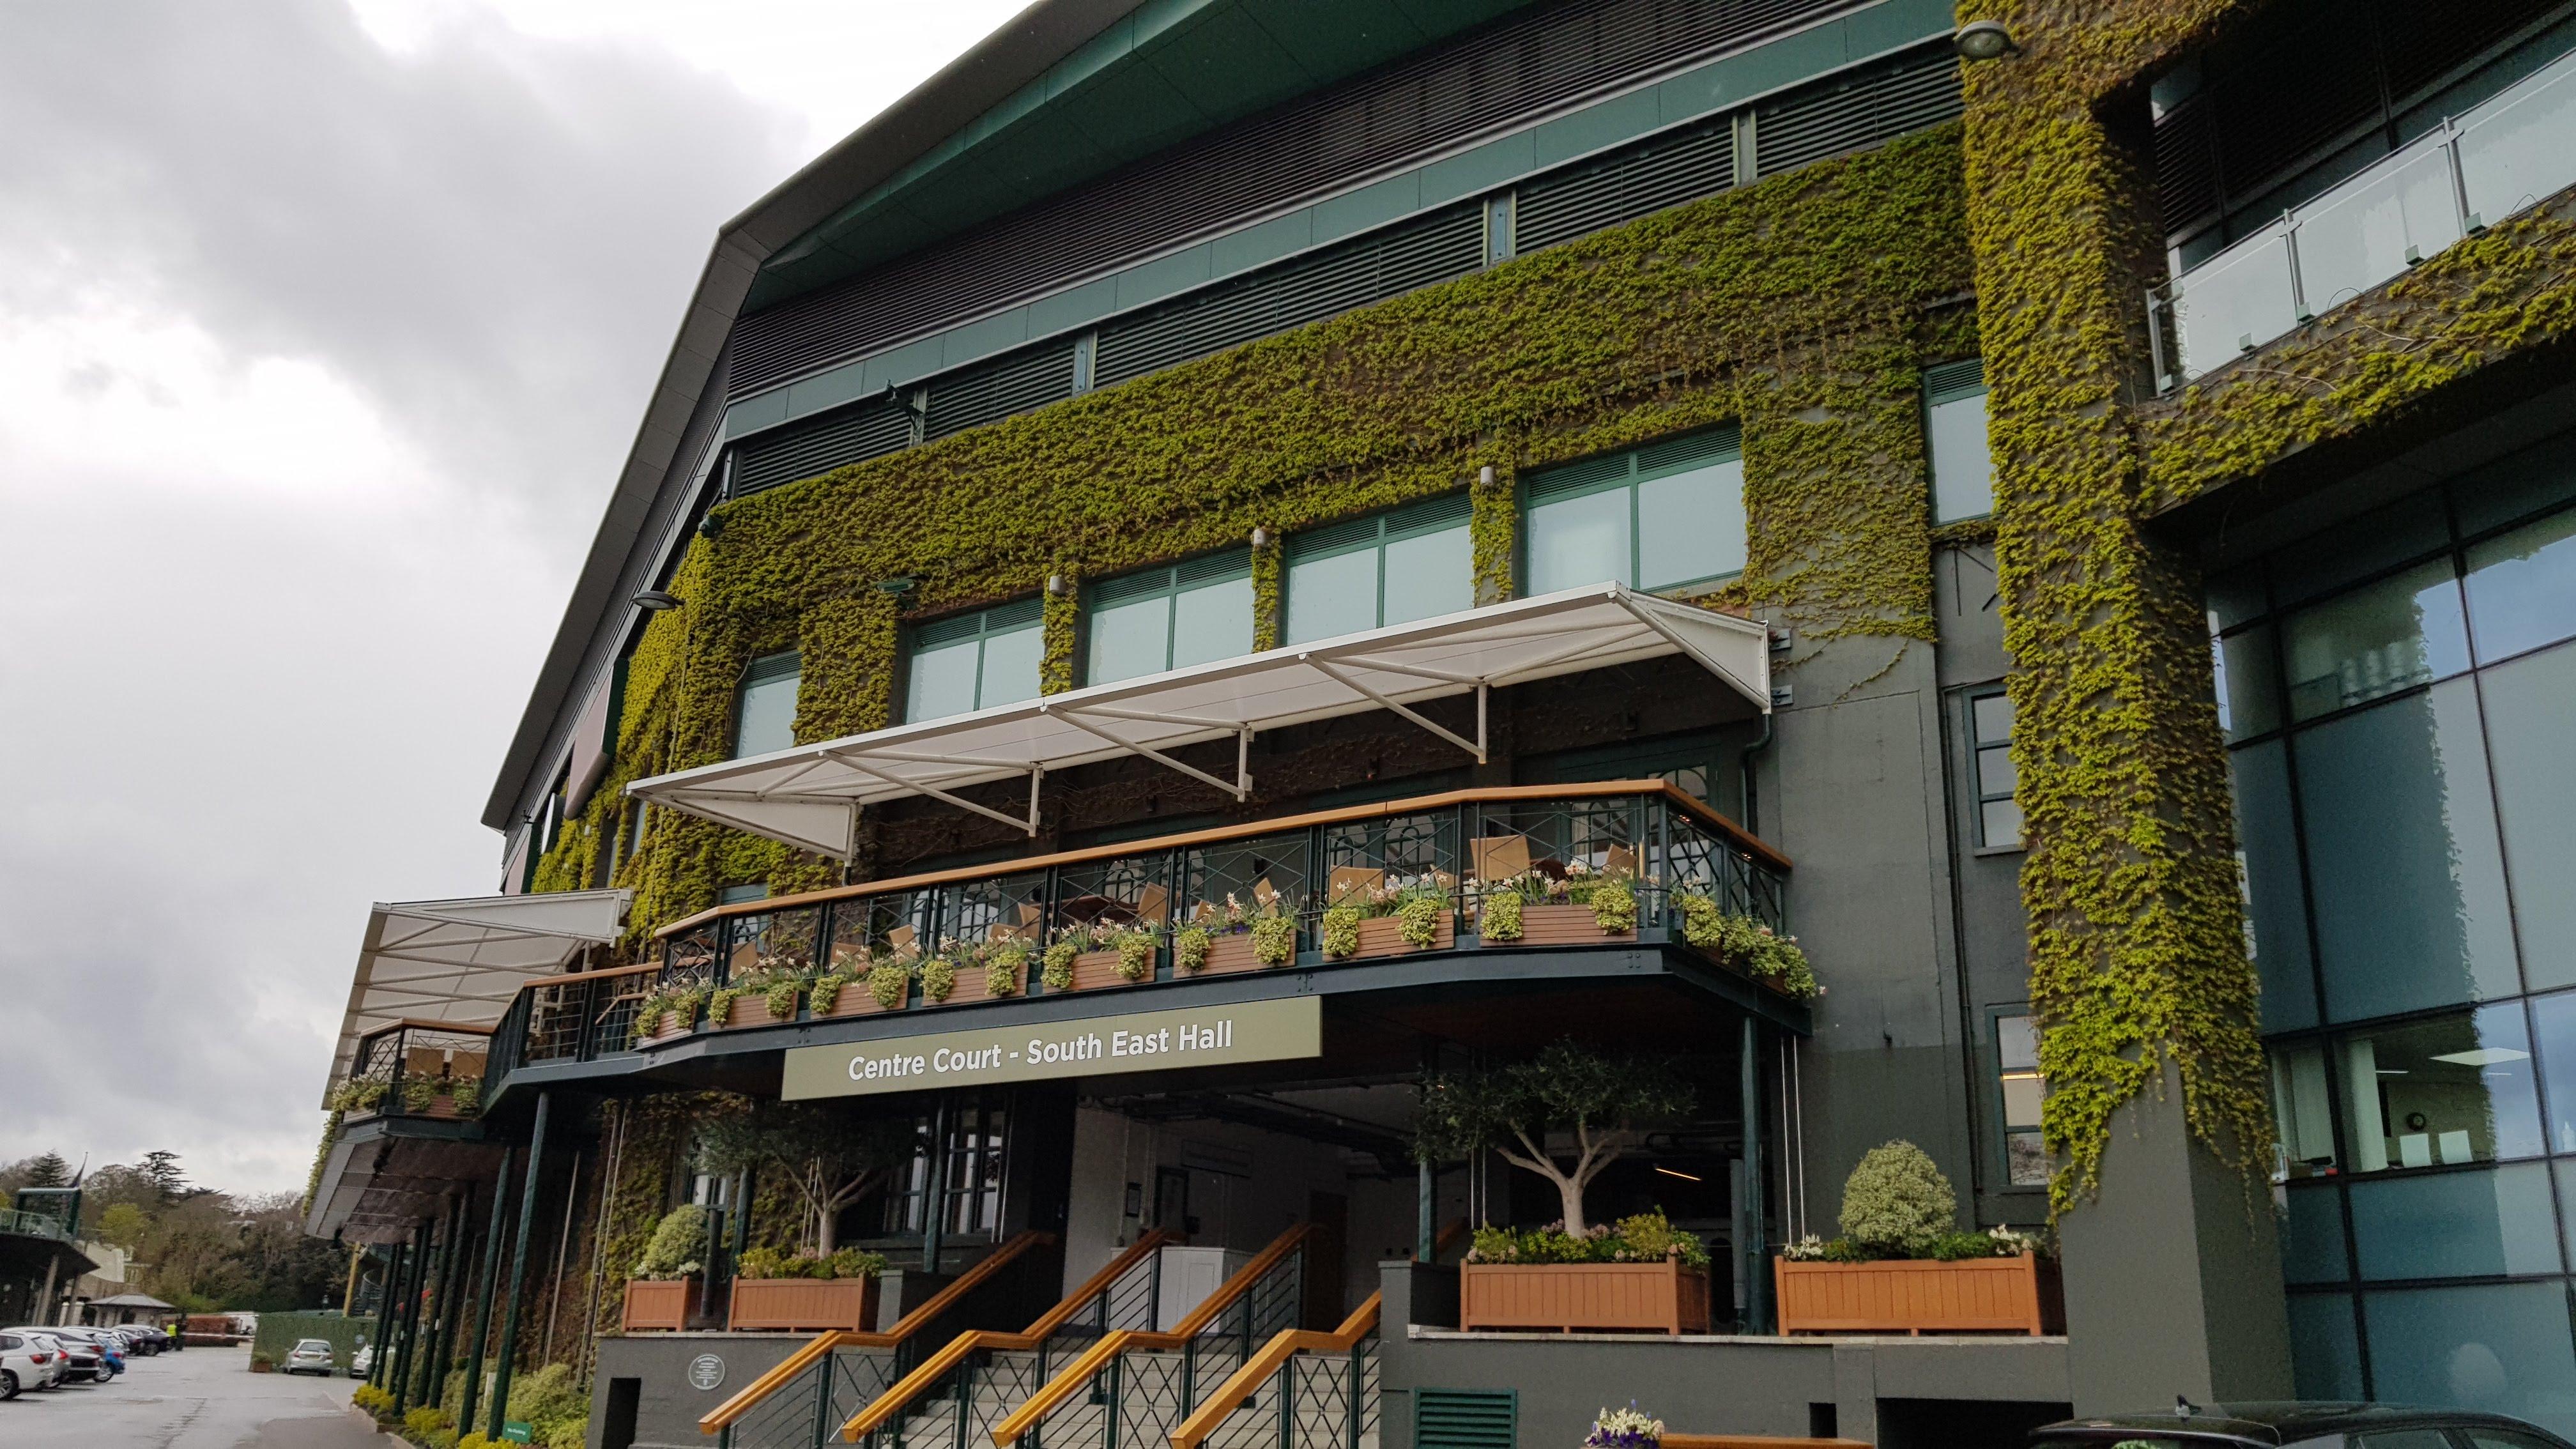 All England Lawn Tennis & Croquet Club, Wimbledon